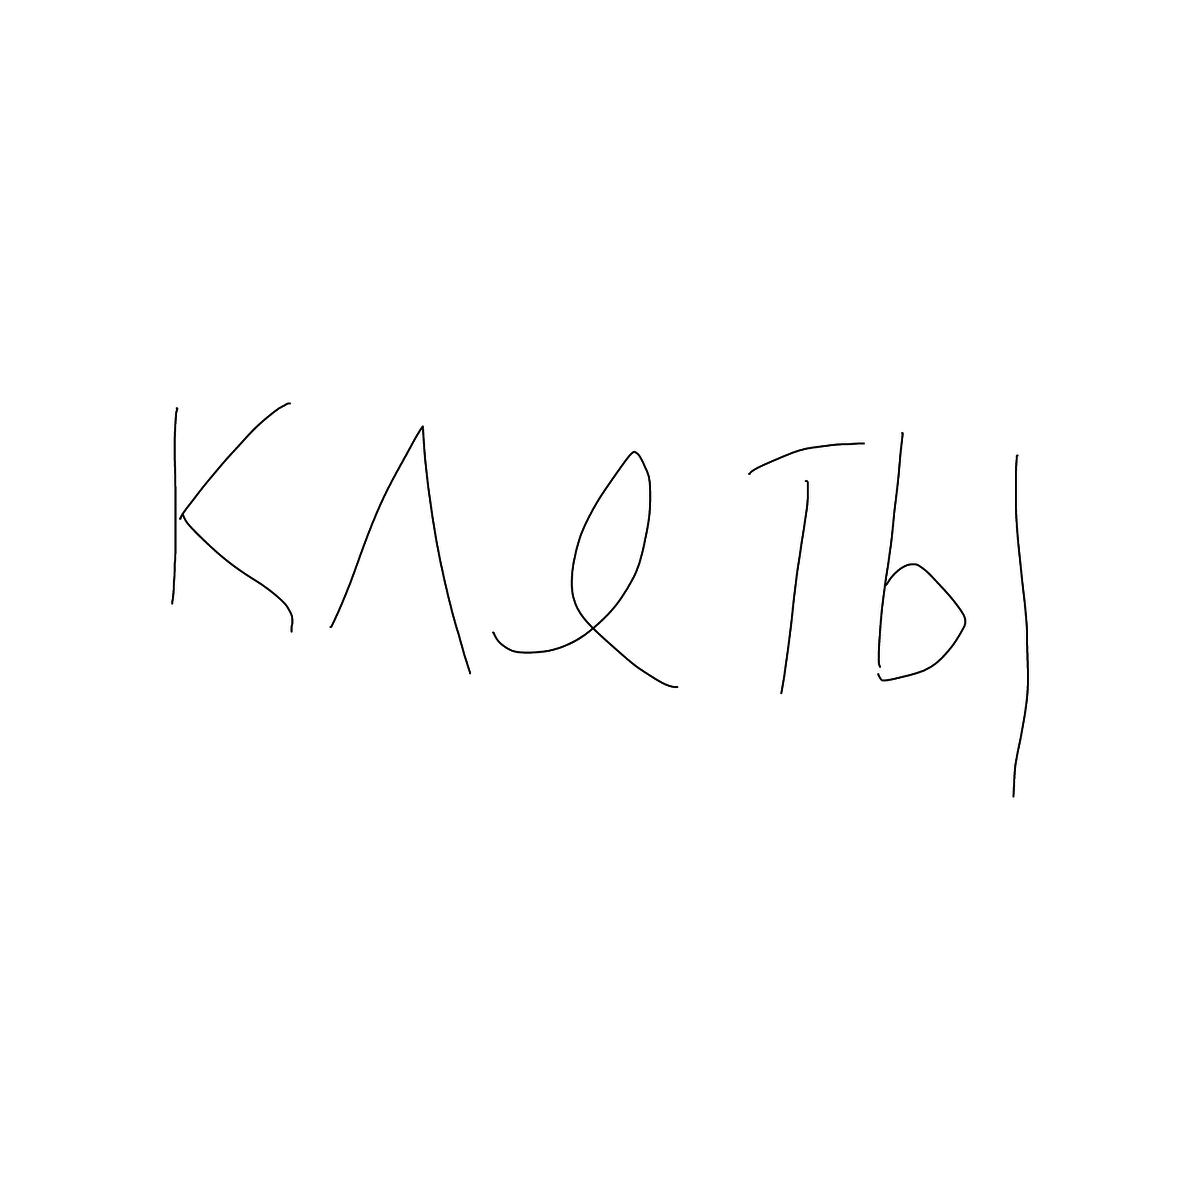 BAAAM drawing#21057 lat:55.7520942687988300lng: 37.6201591491699200